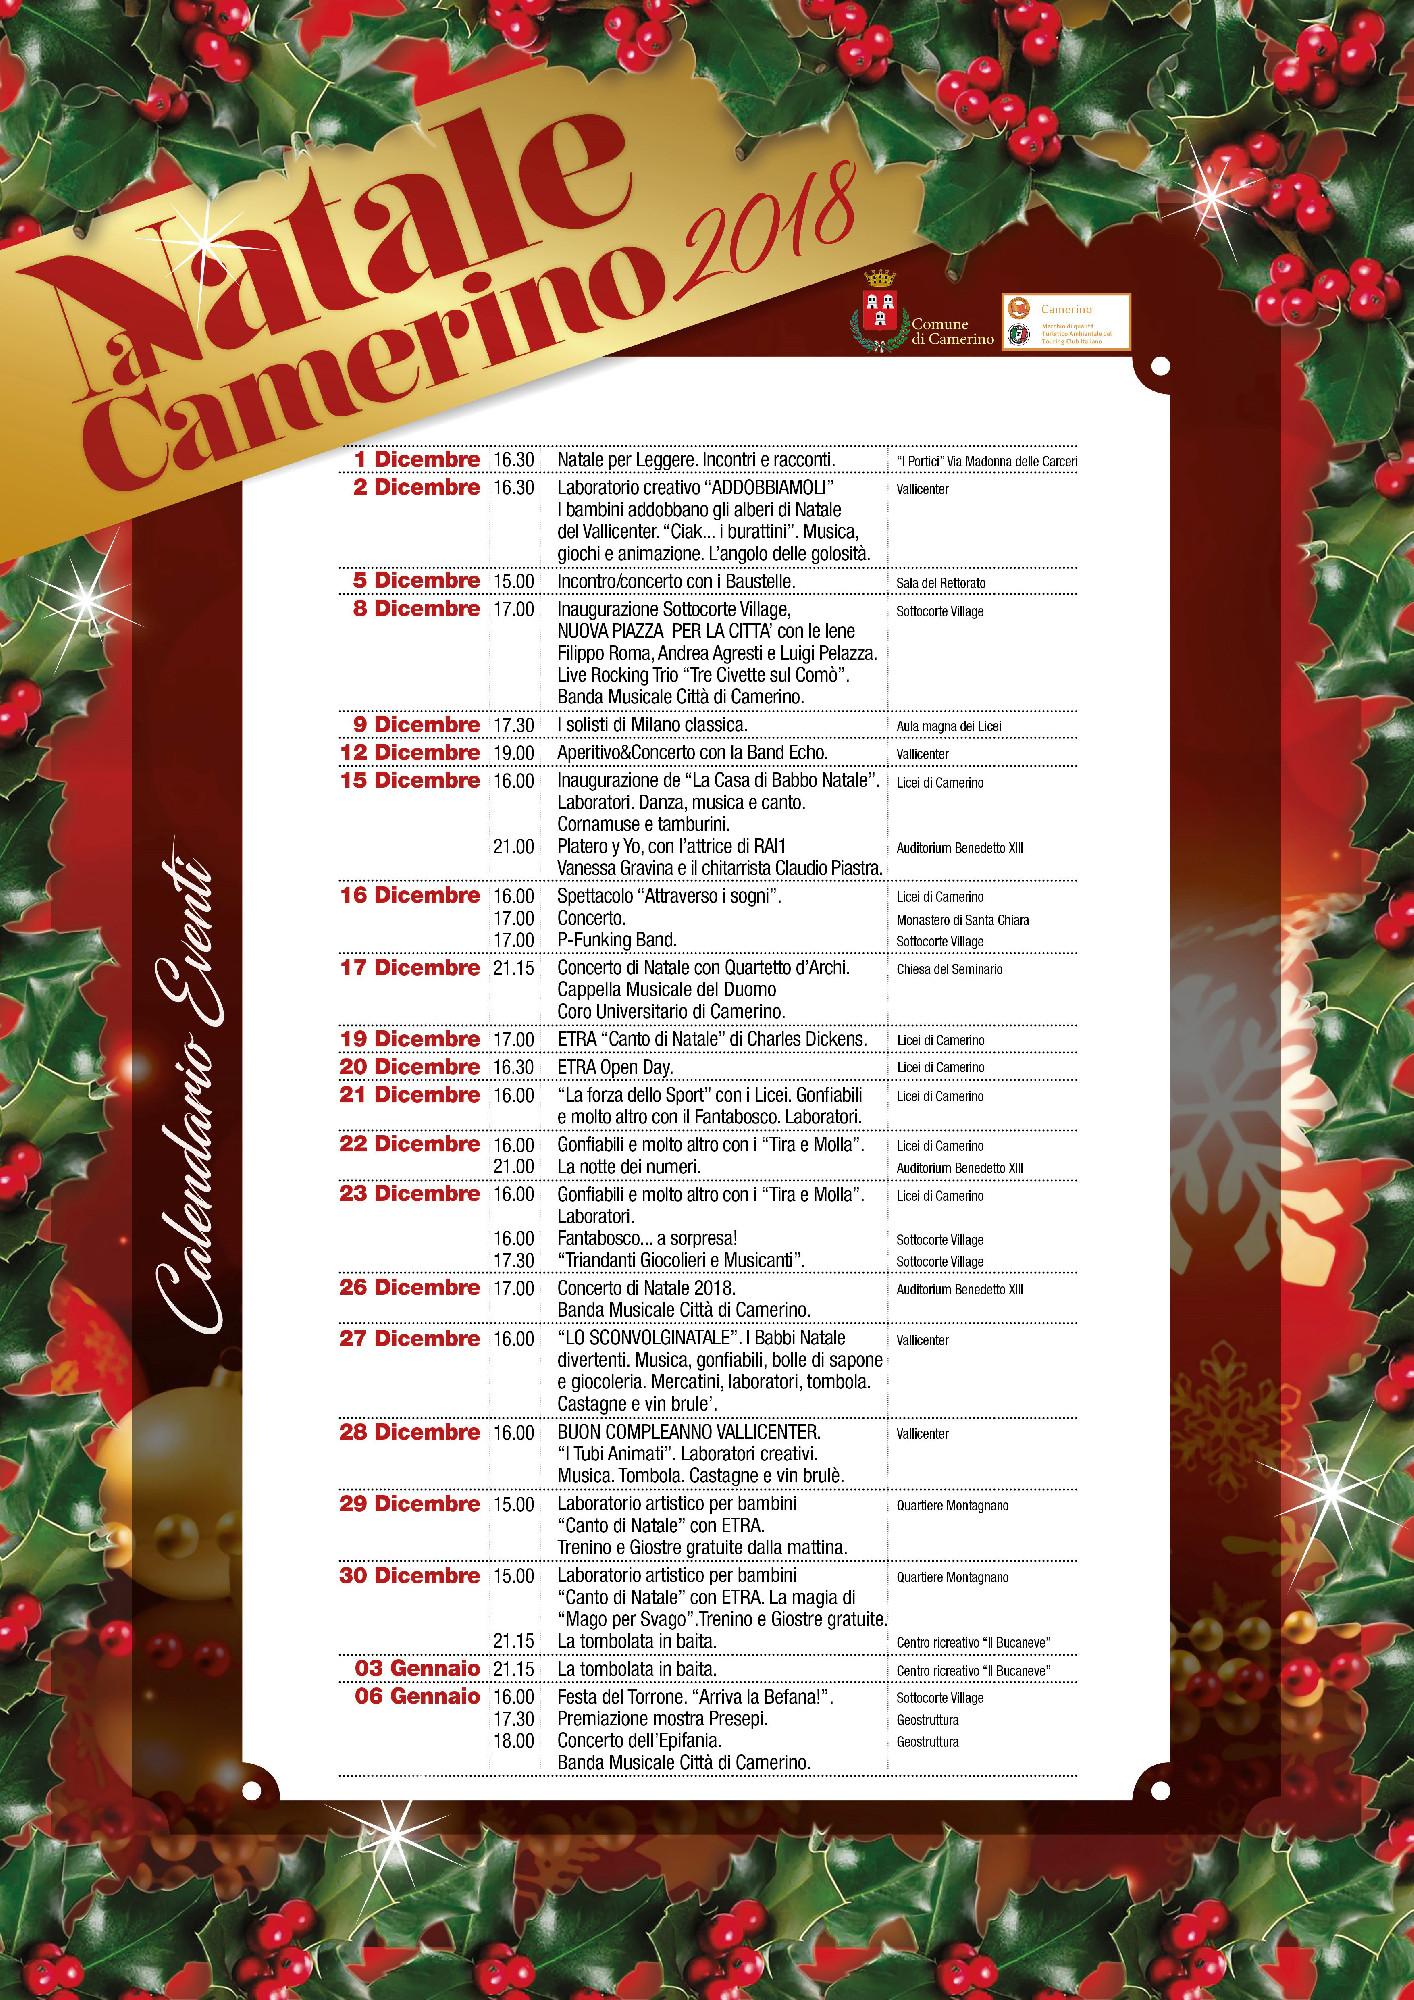 Natale Calendario.Calendario Natale Comune Camerino 2018 2019 Picchio News